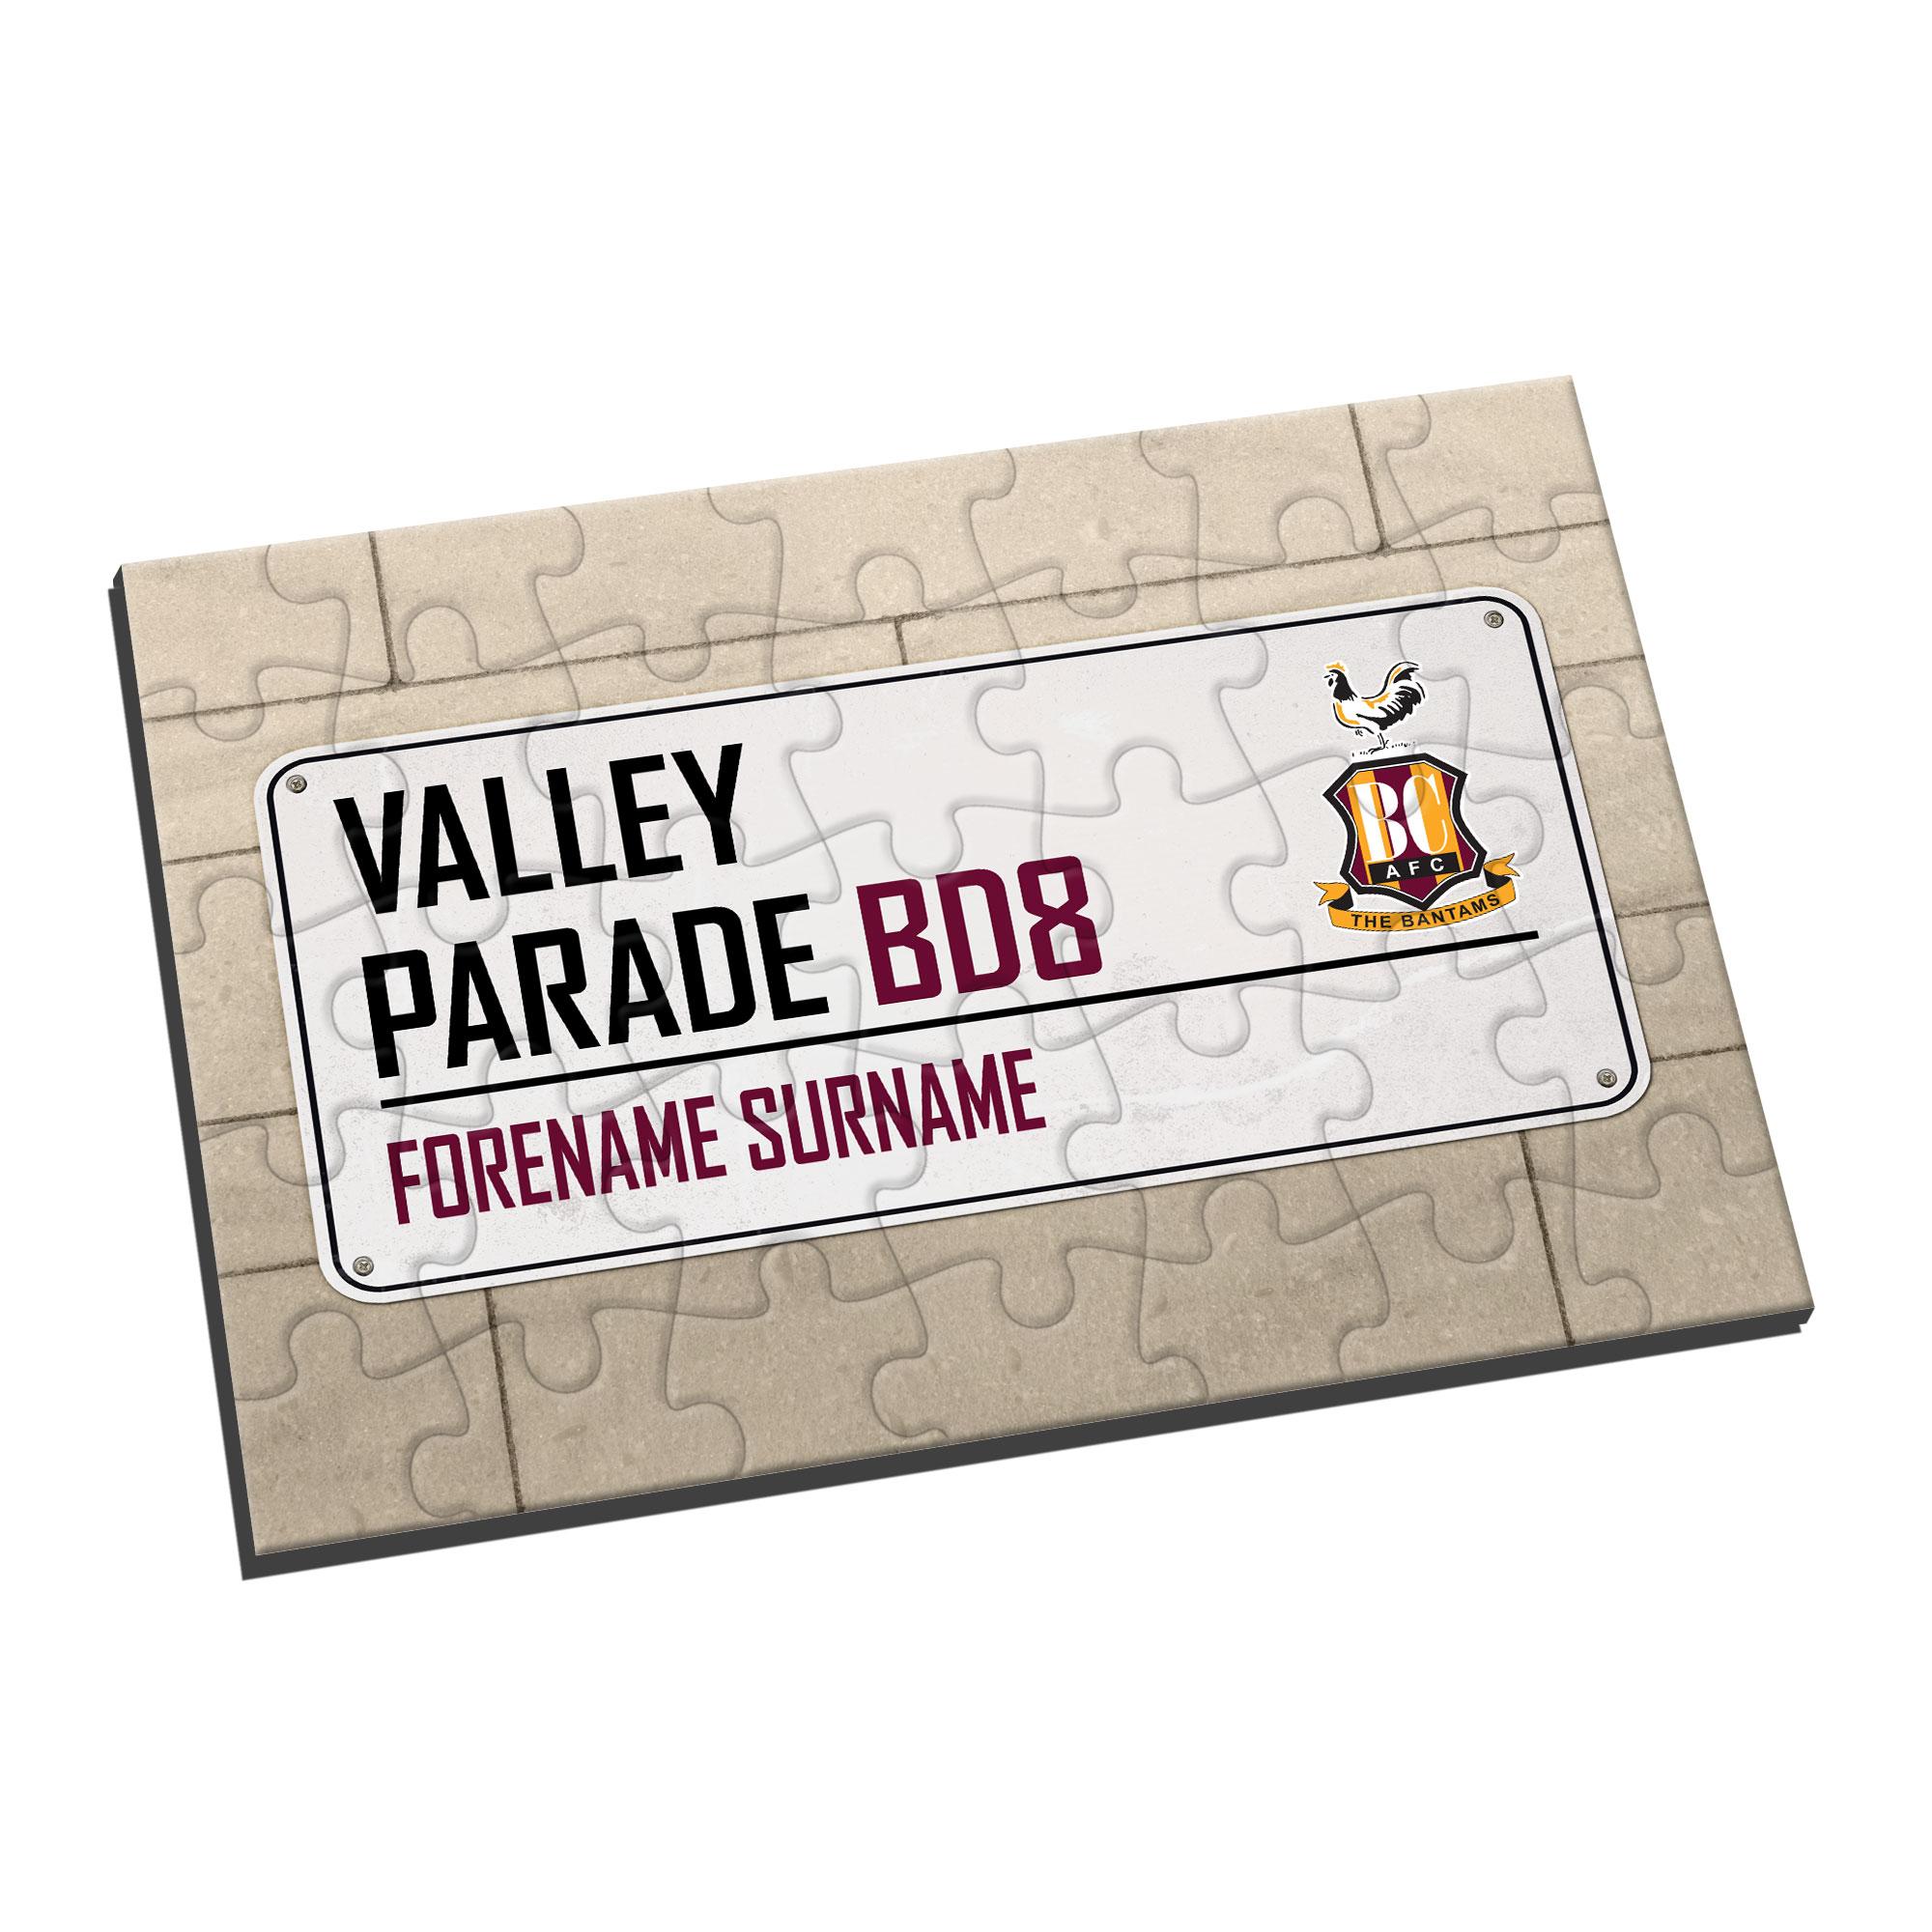 Bradford City AFC Street Sign Jigsaw